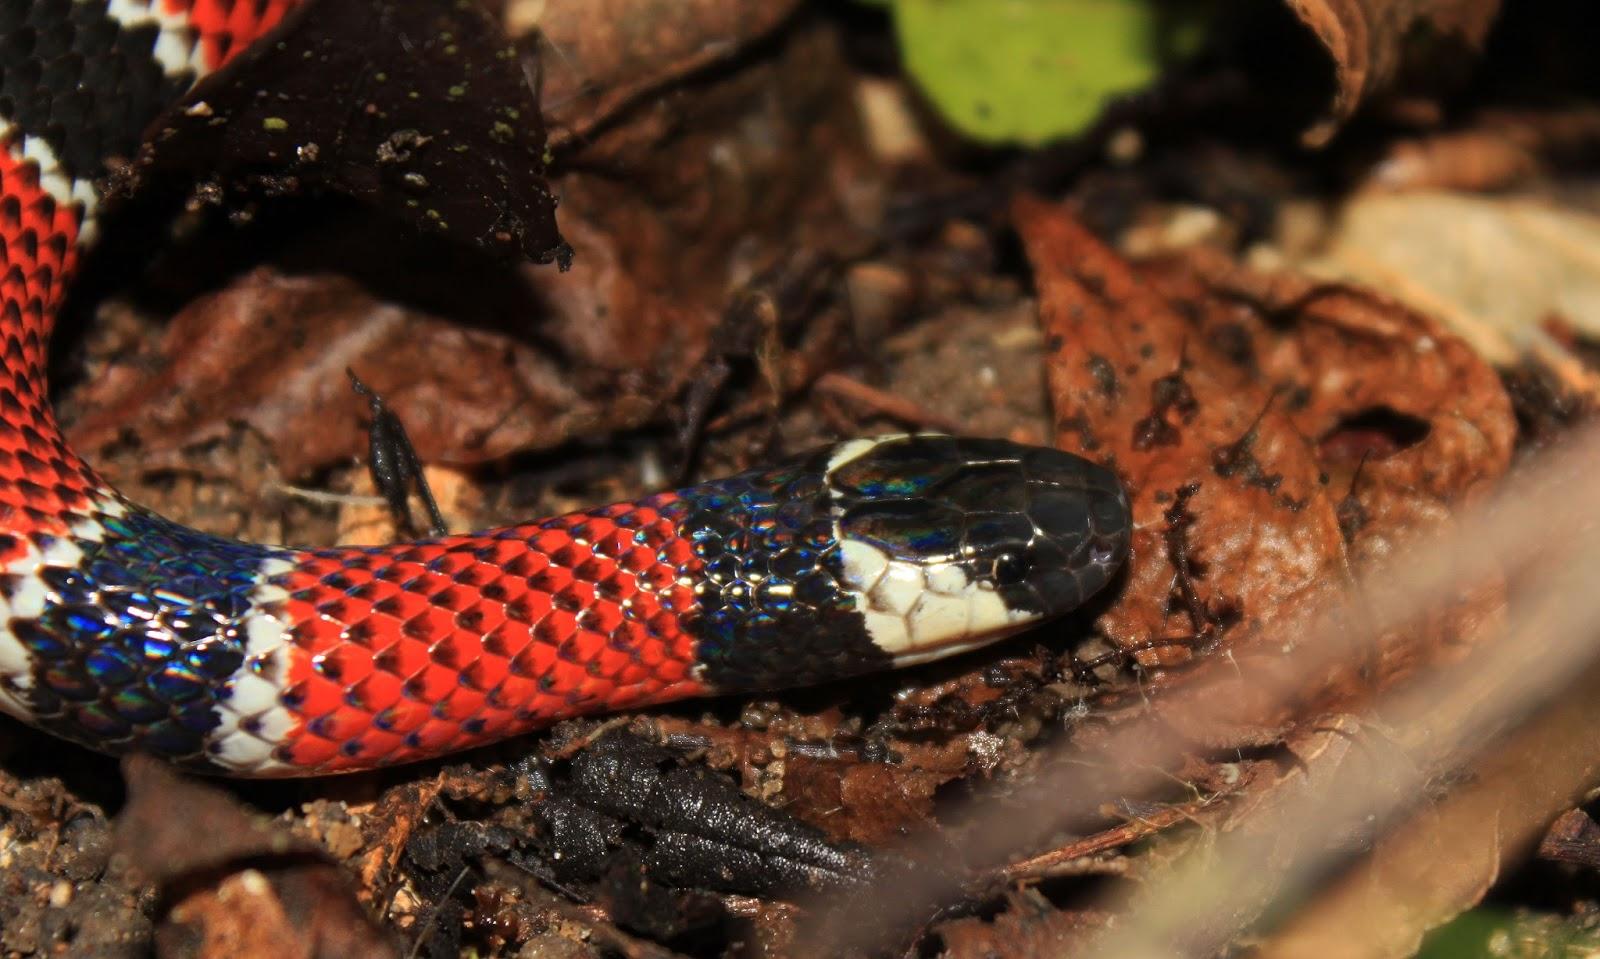 Very Rare Reptiles on People Are Very Rare